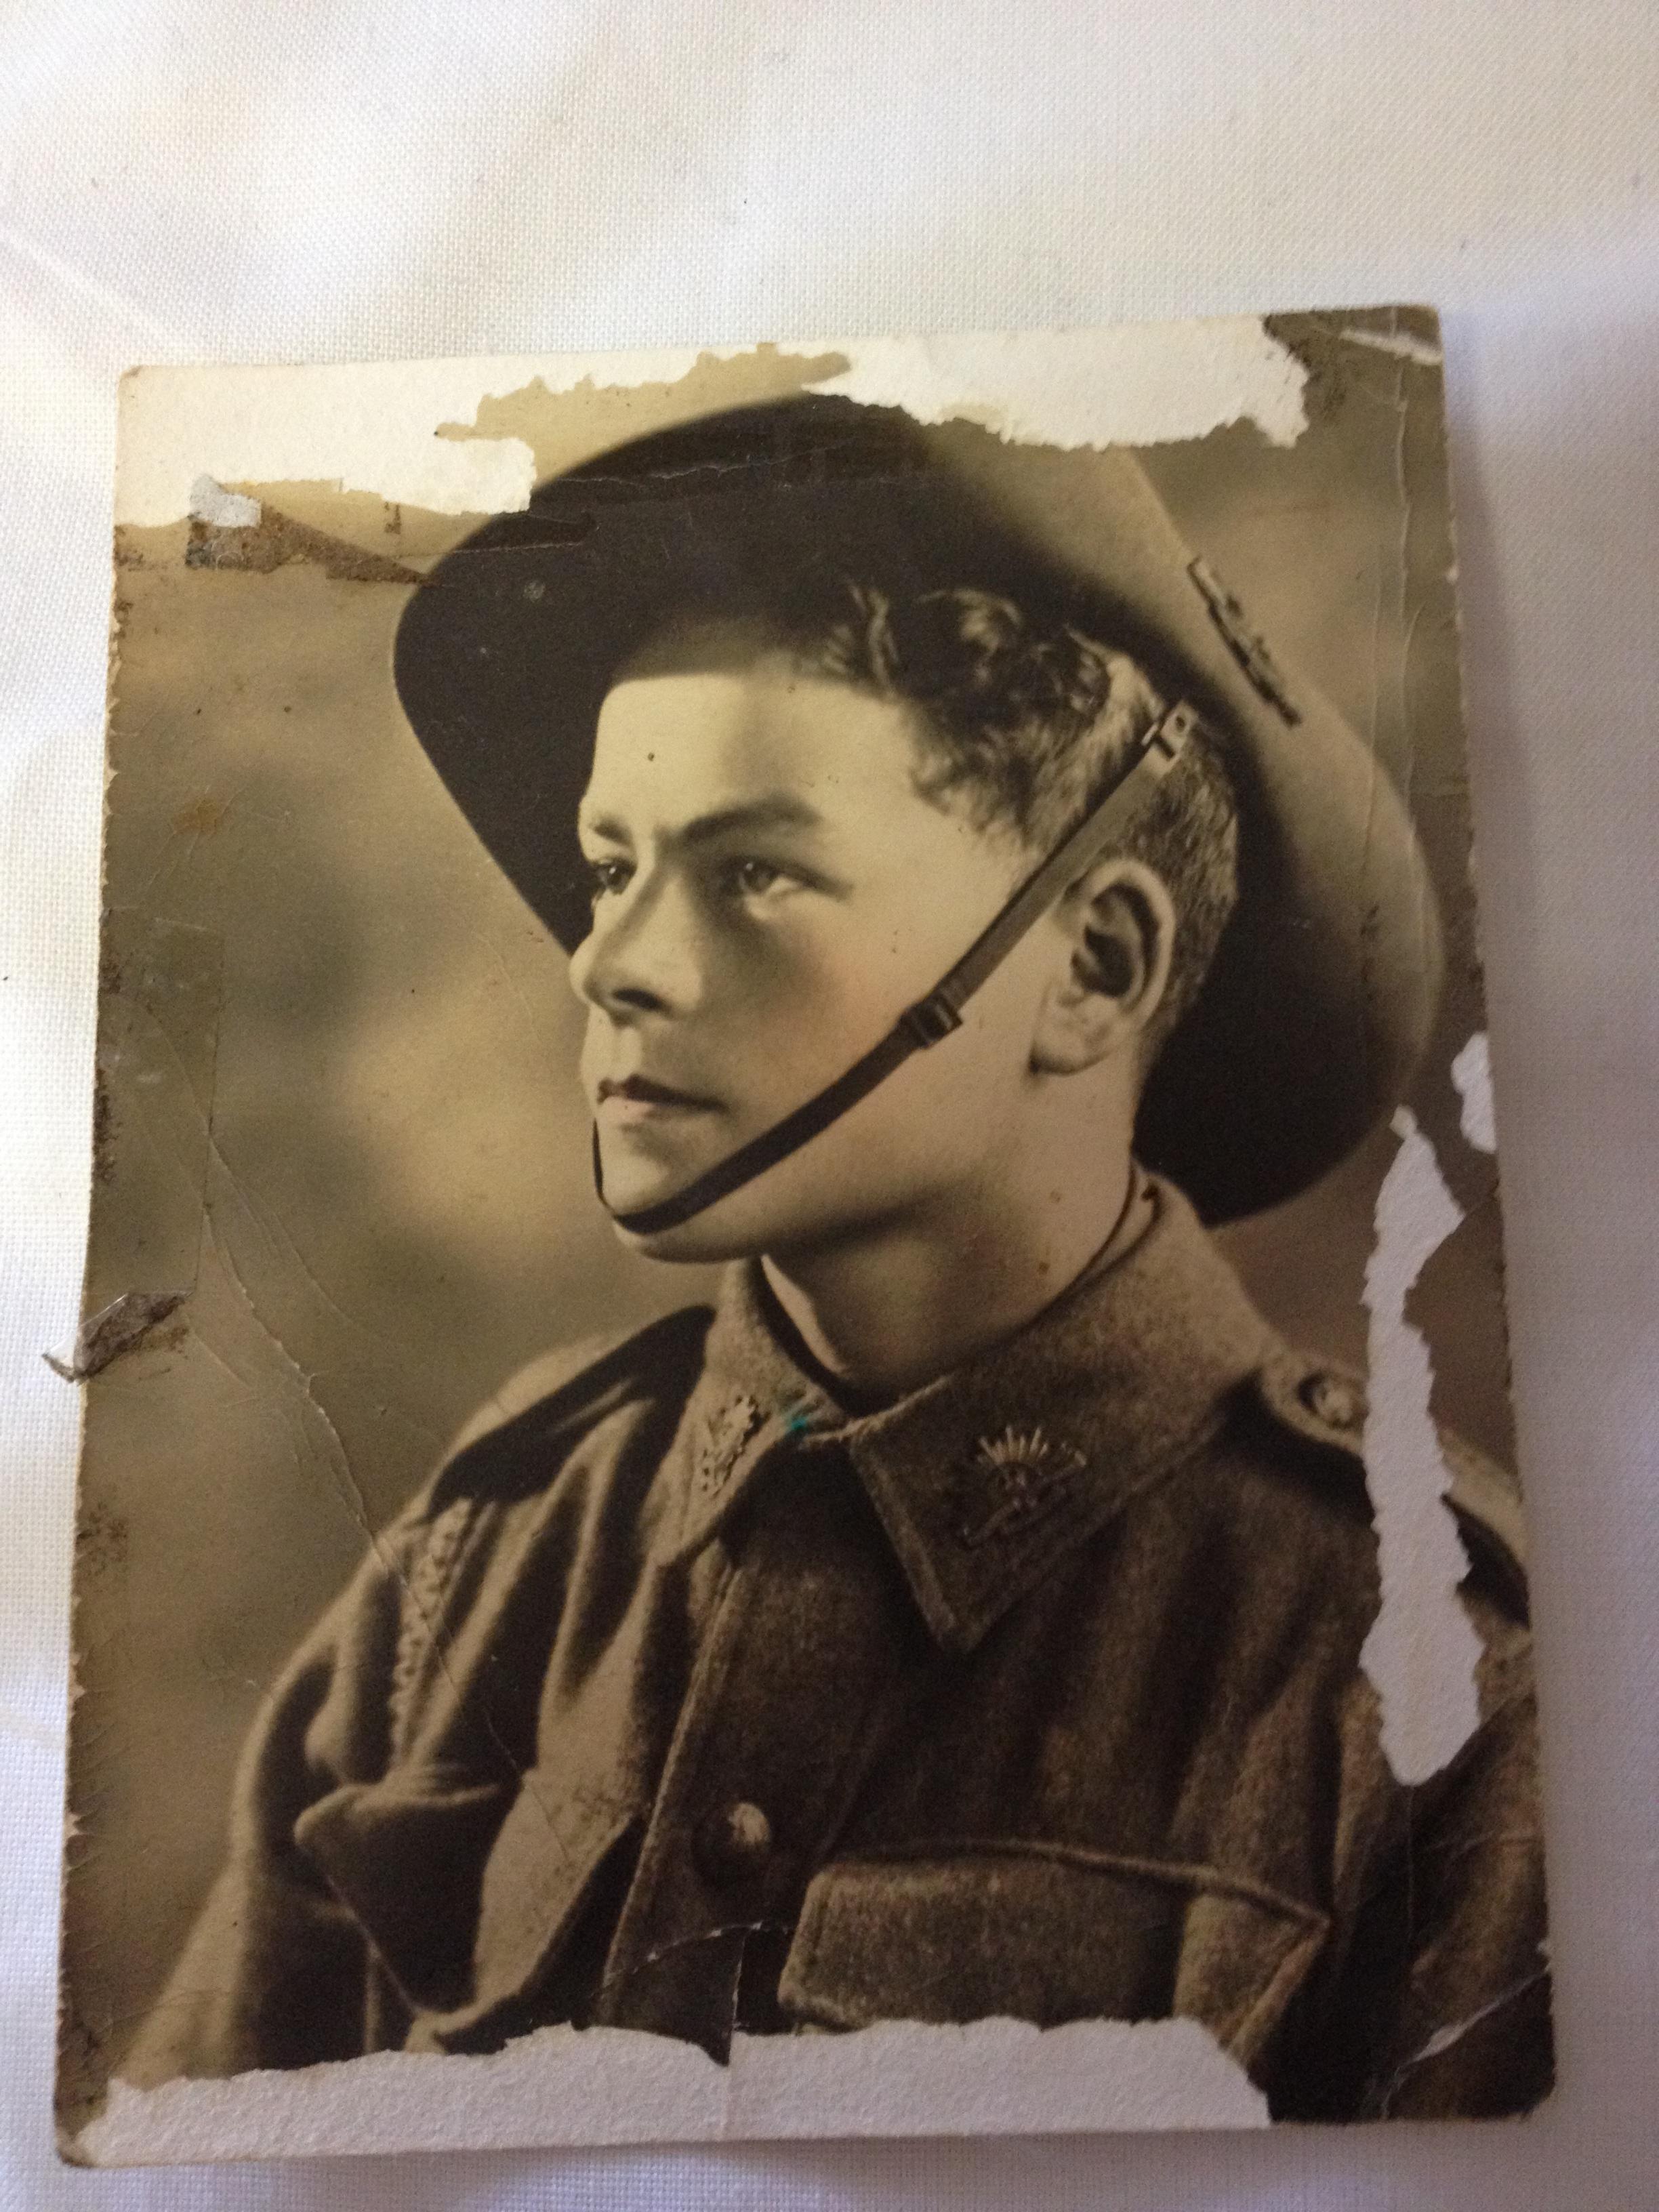 Gambar Anak Laki Laki Anak Potret Muda Tentara